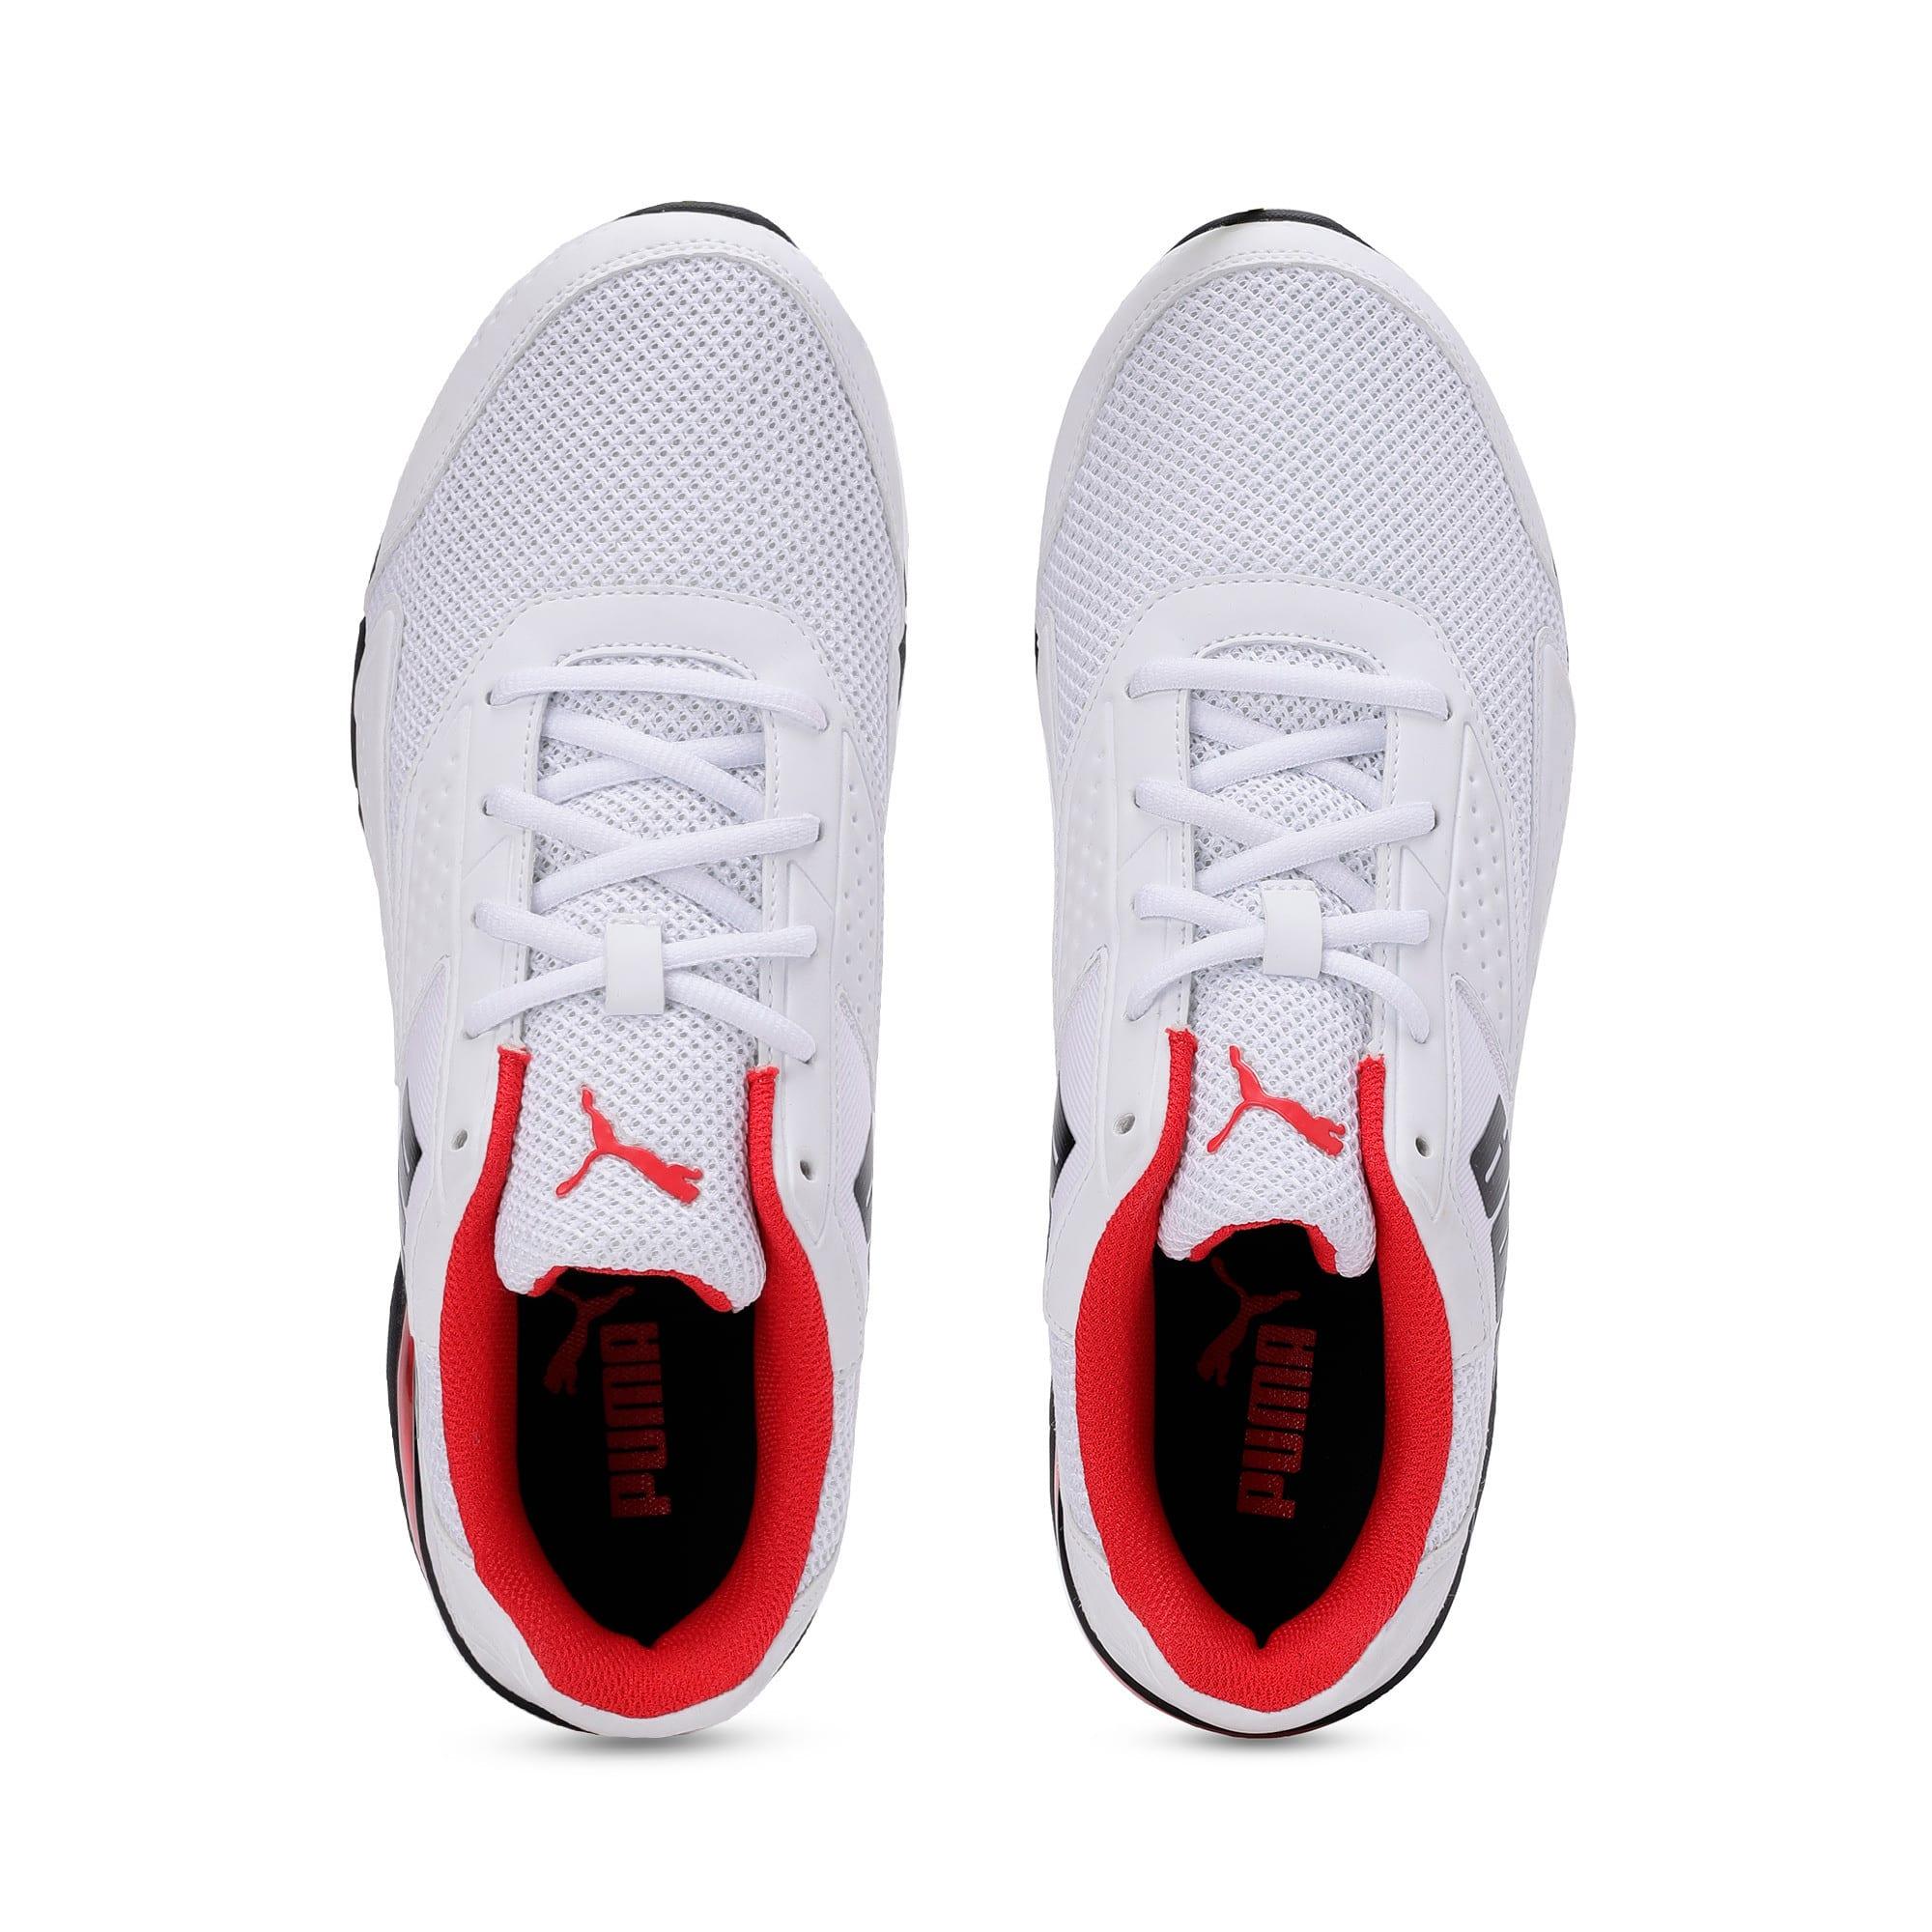 Thumbnail 6 of Leader VT NU Training Shoes, Puma Wht-Hgh Rsk Rd-Pma Blk, medium-IND